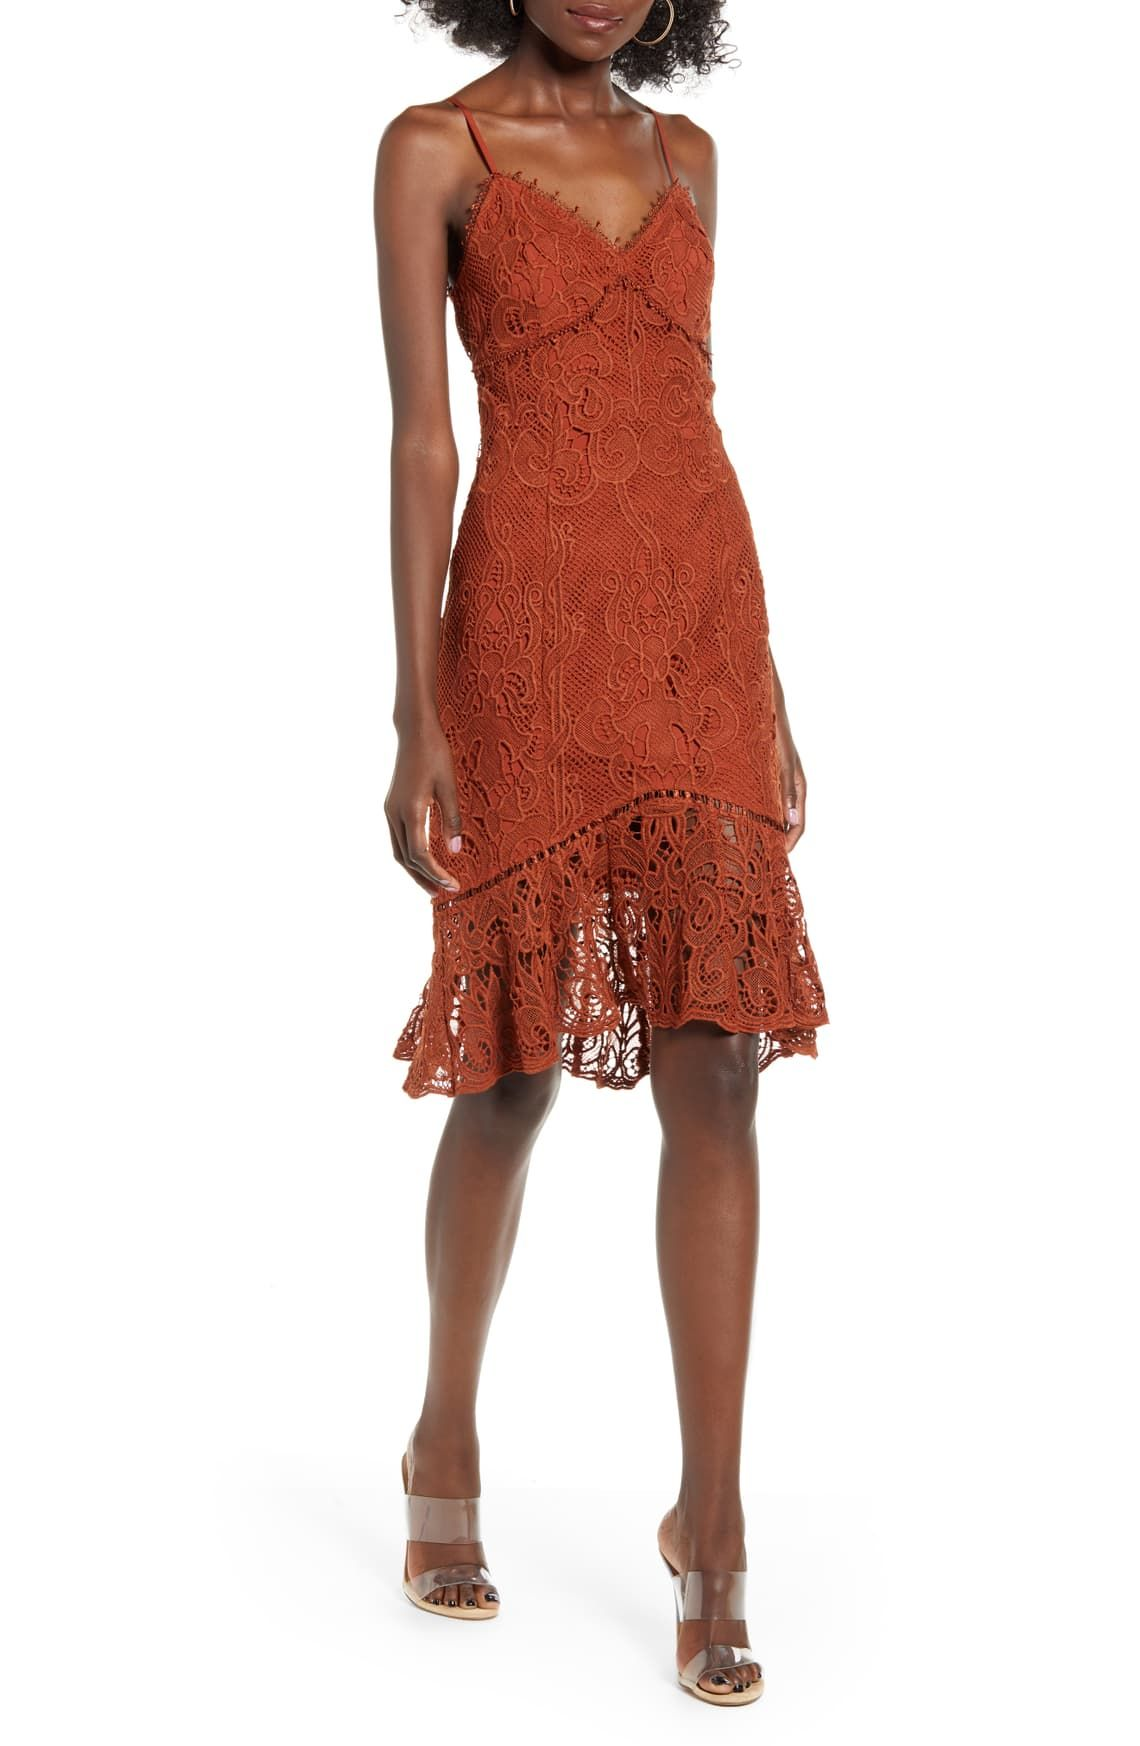 J O A Lace Slipdress Nordstrom Fashion Clothes Women Fashion Dresses [ 1746 x 1140 Pixel ]